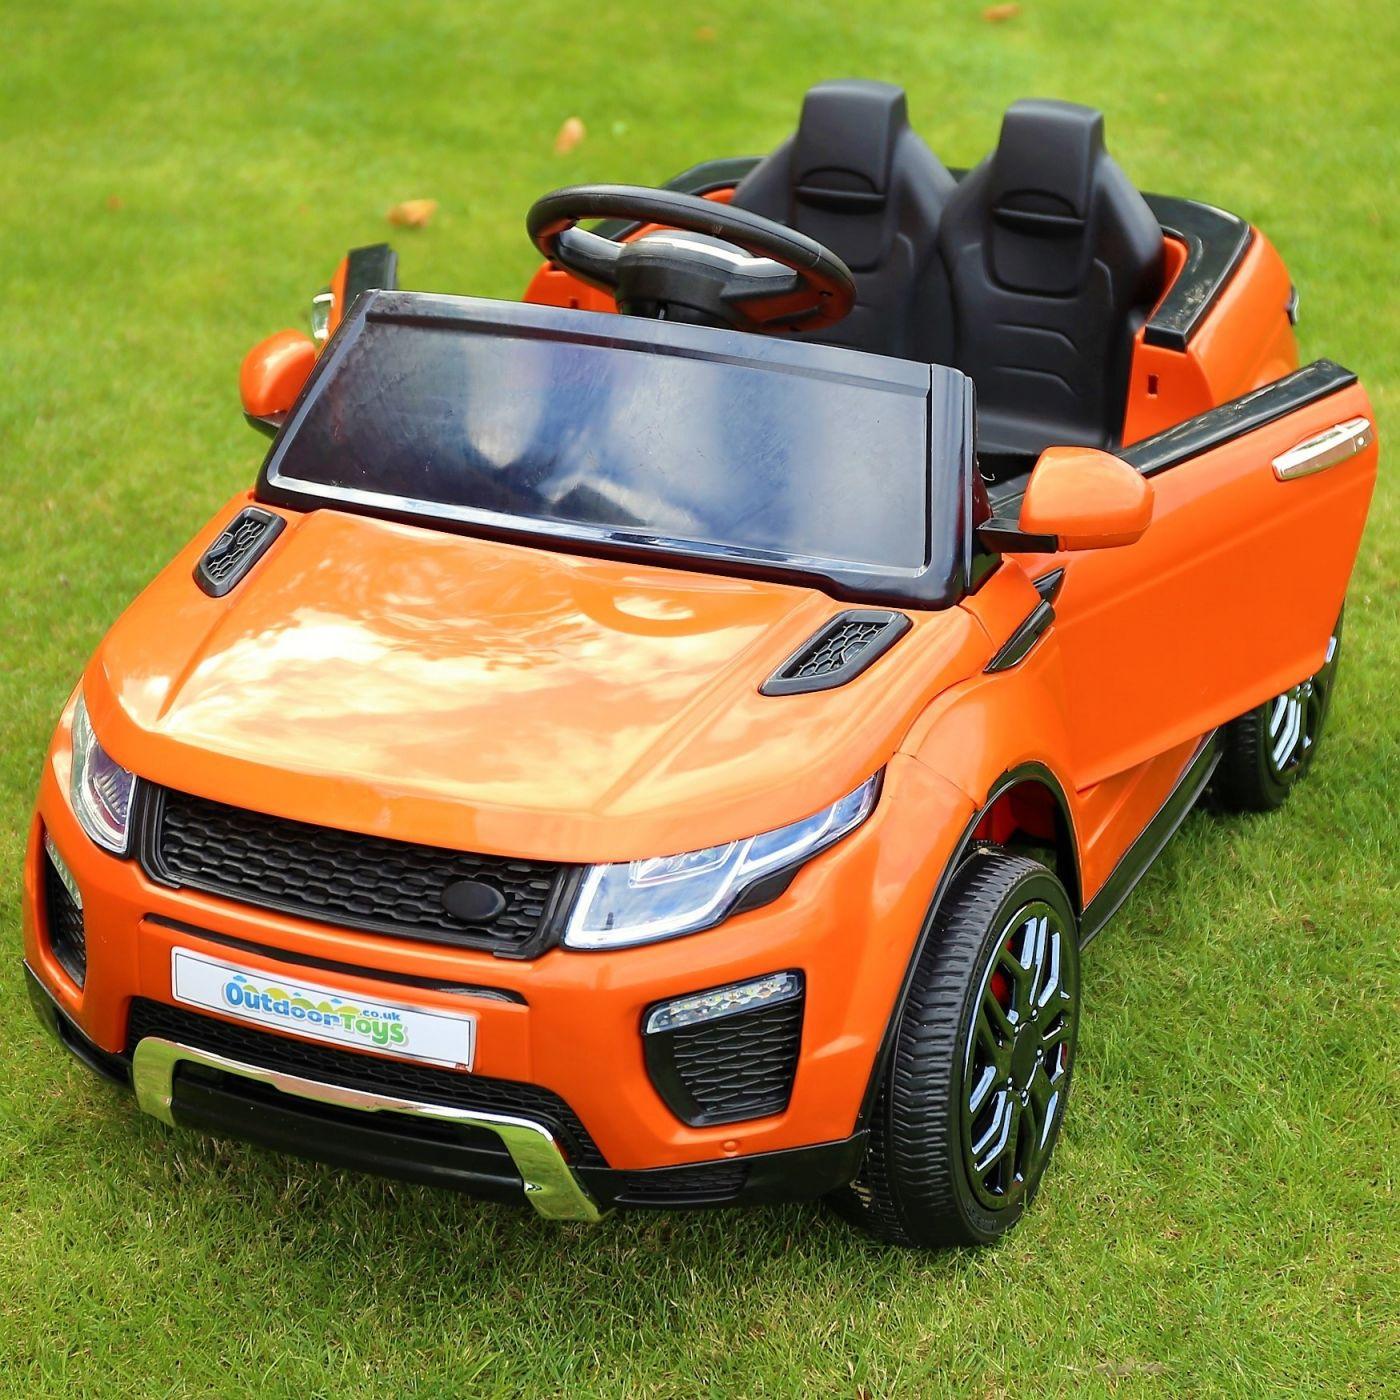 Range Rover Evoque Style 12v Child's Ride On Car - Orange